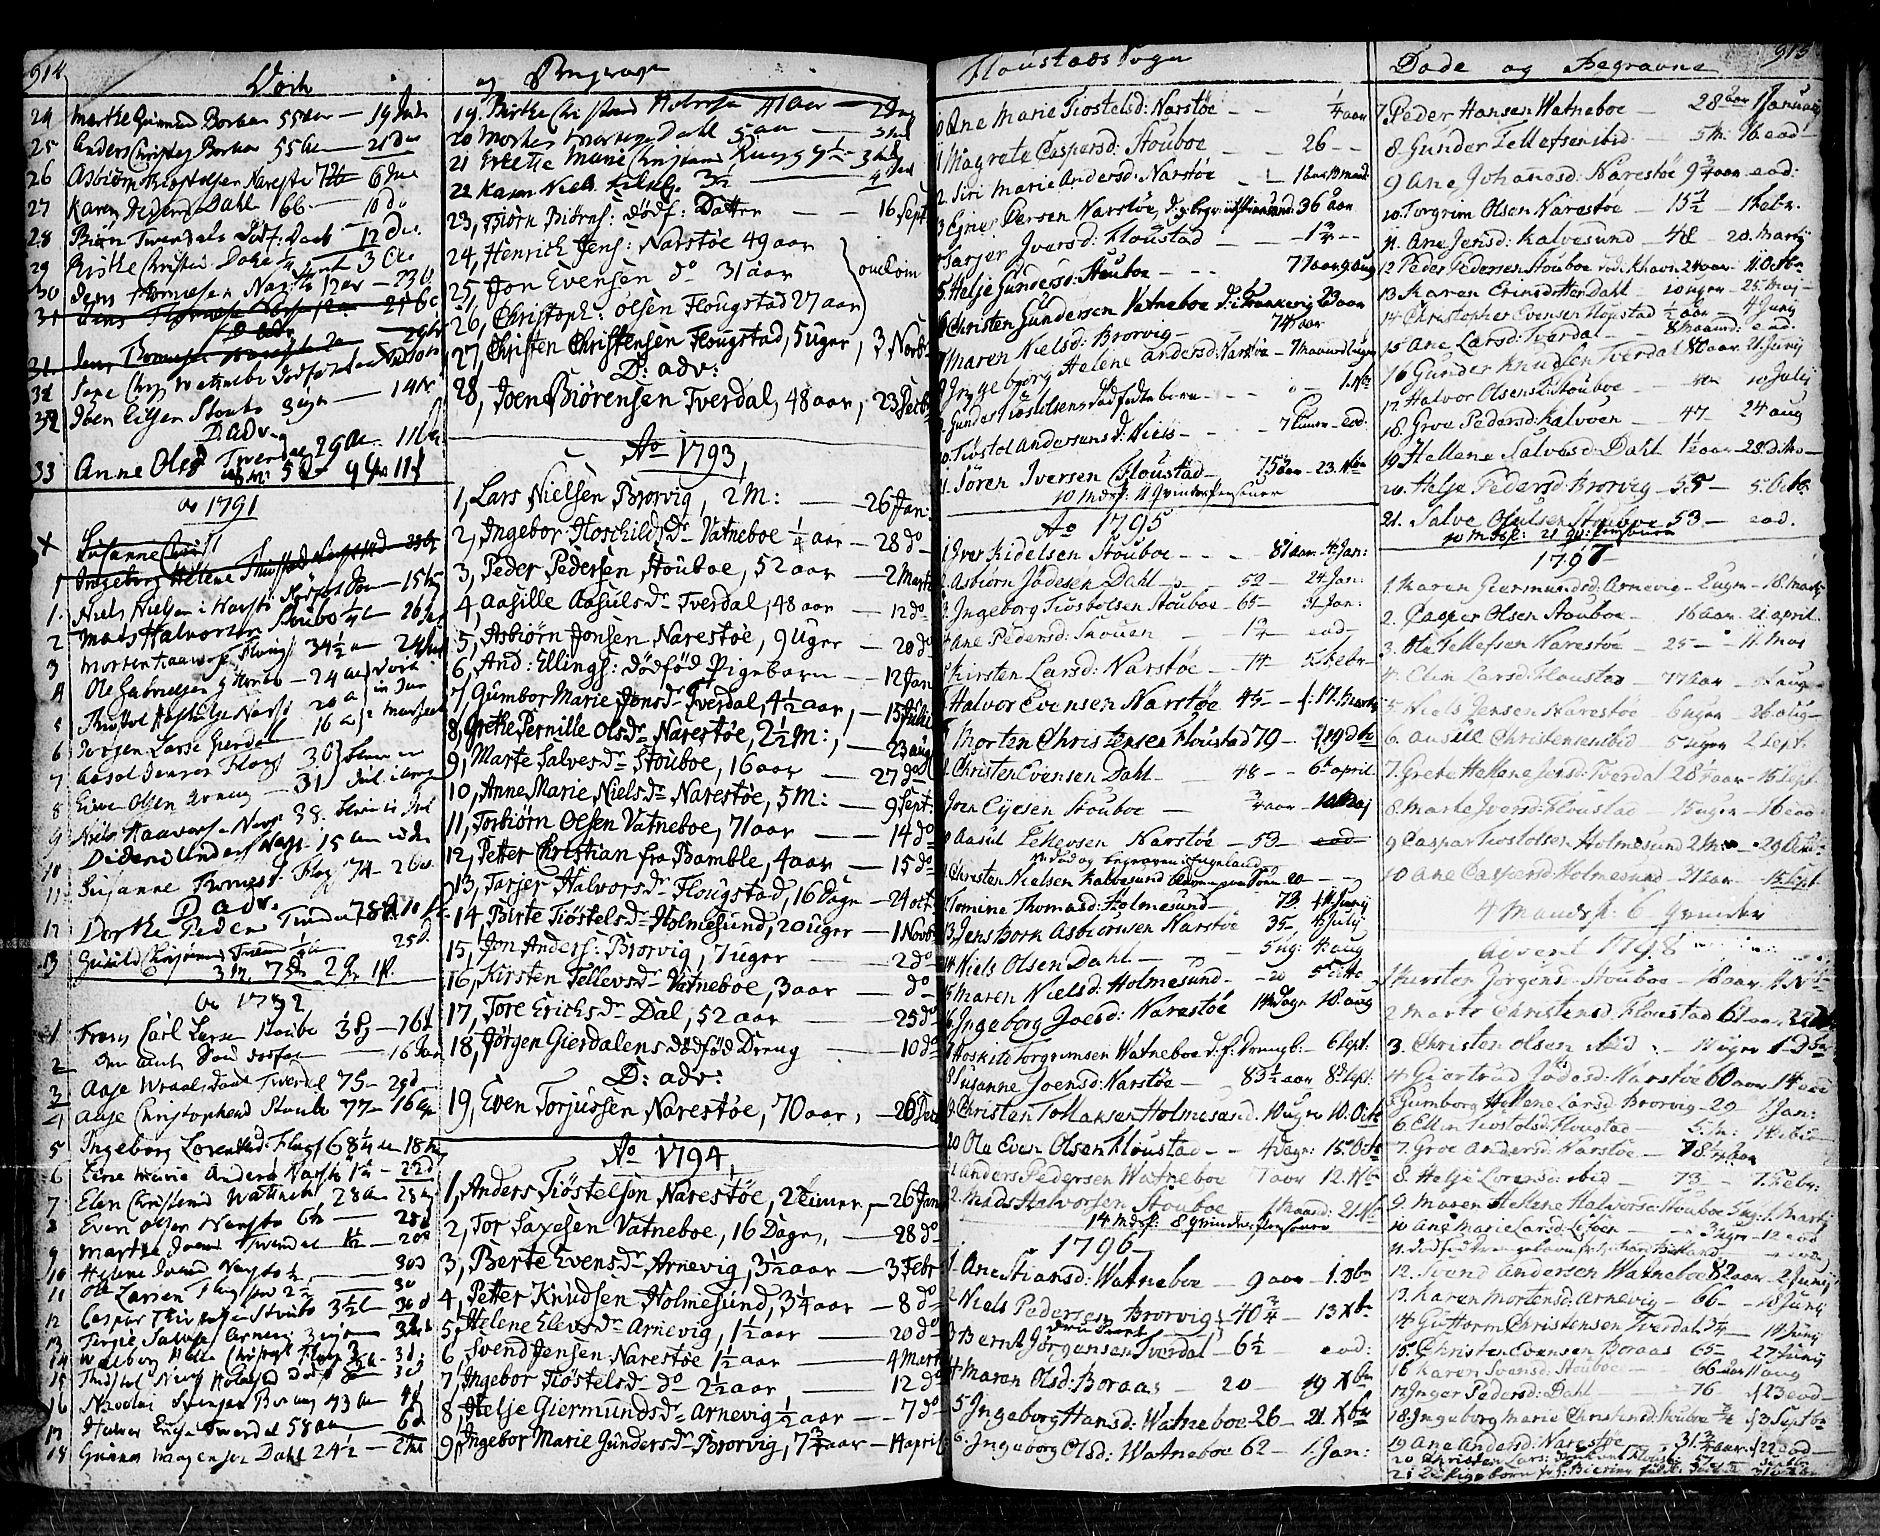 SAK, Dypvåg sokneprestkontor, F/Fa/Faa/L0001: Ministerialbok nr. A 1 /2, 1765-1798, s. 914-915